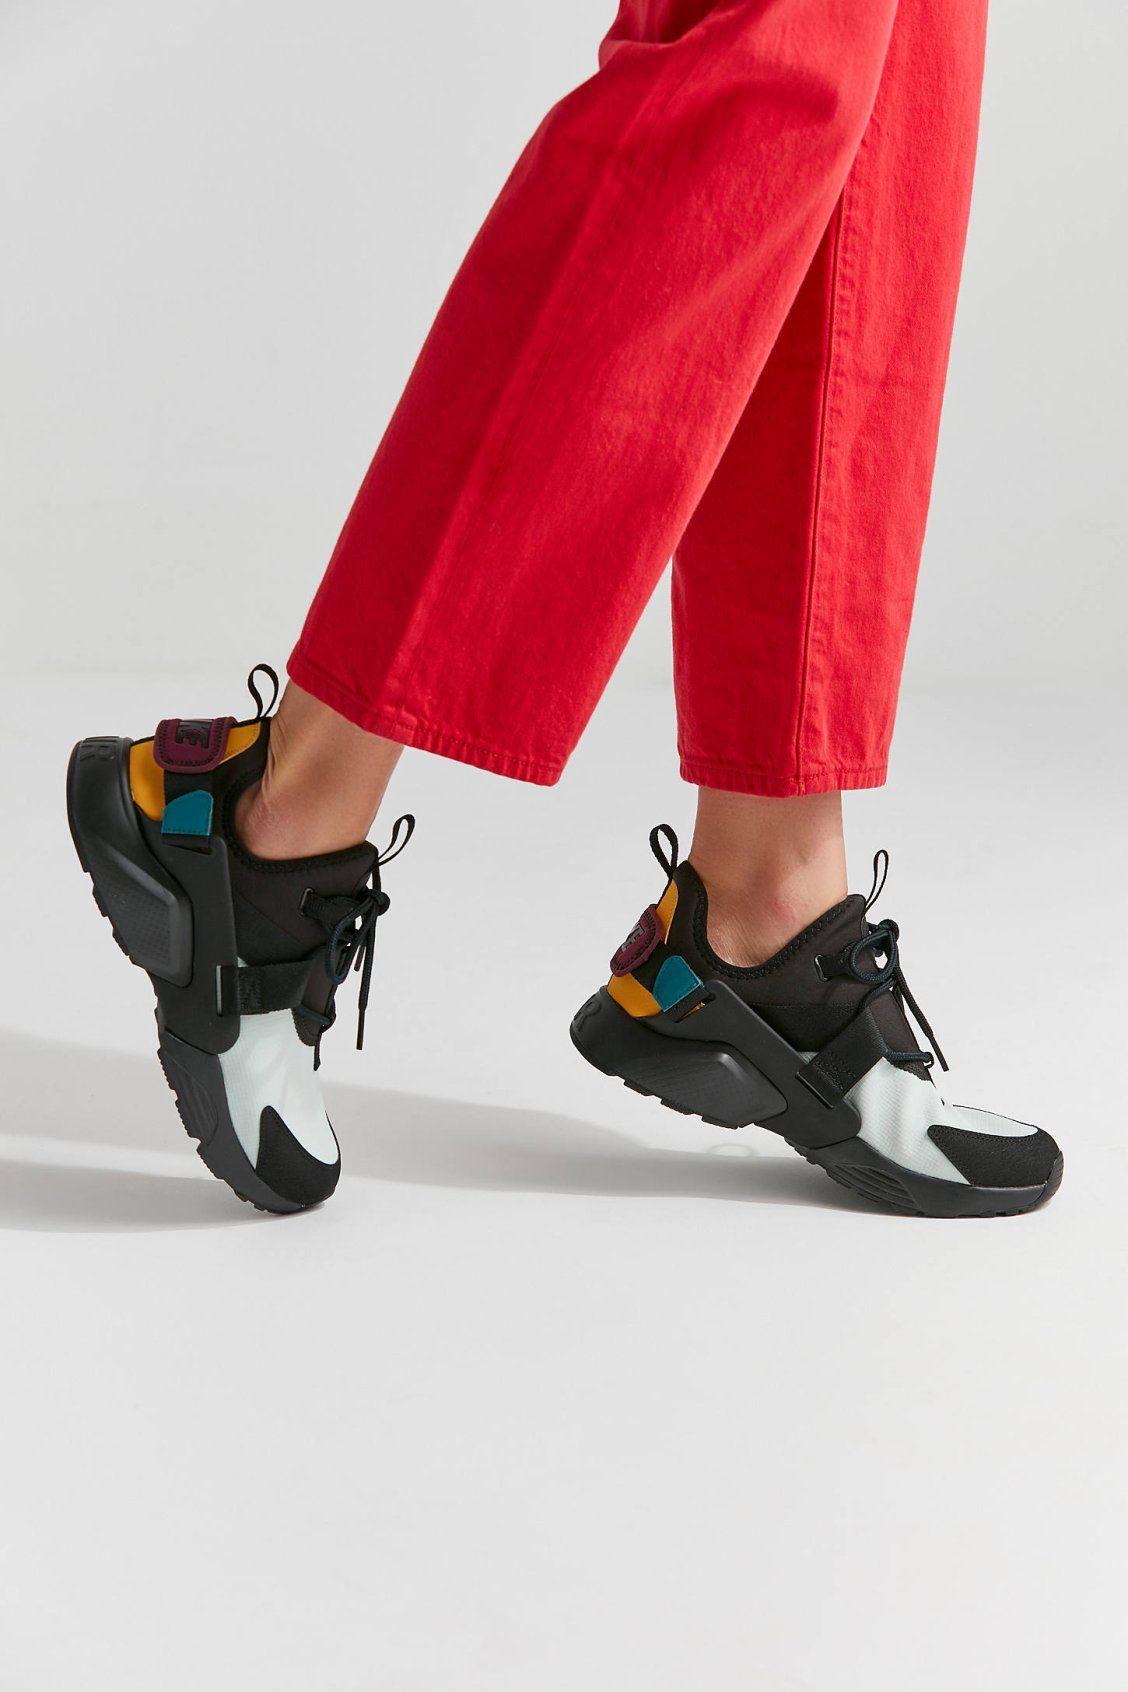 5cc8aea7c329 Nike Air Huarache City Low Sneaker in 2019